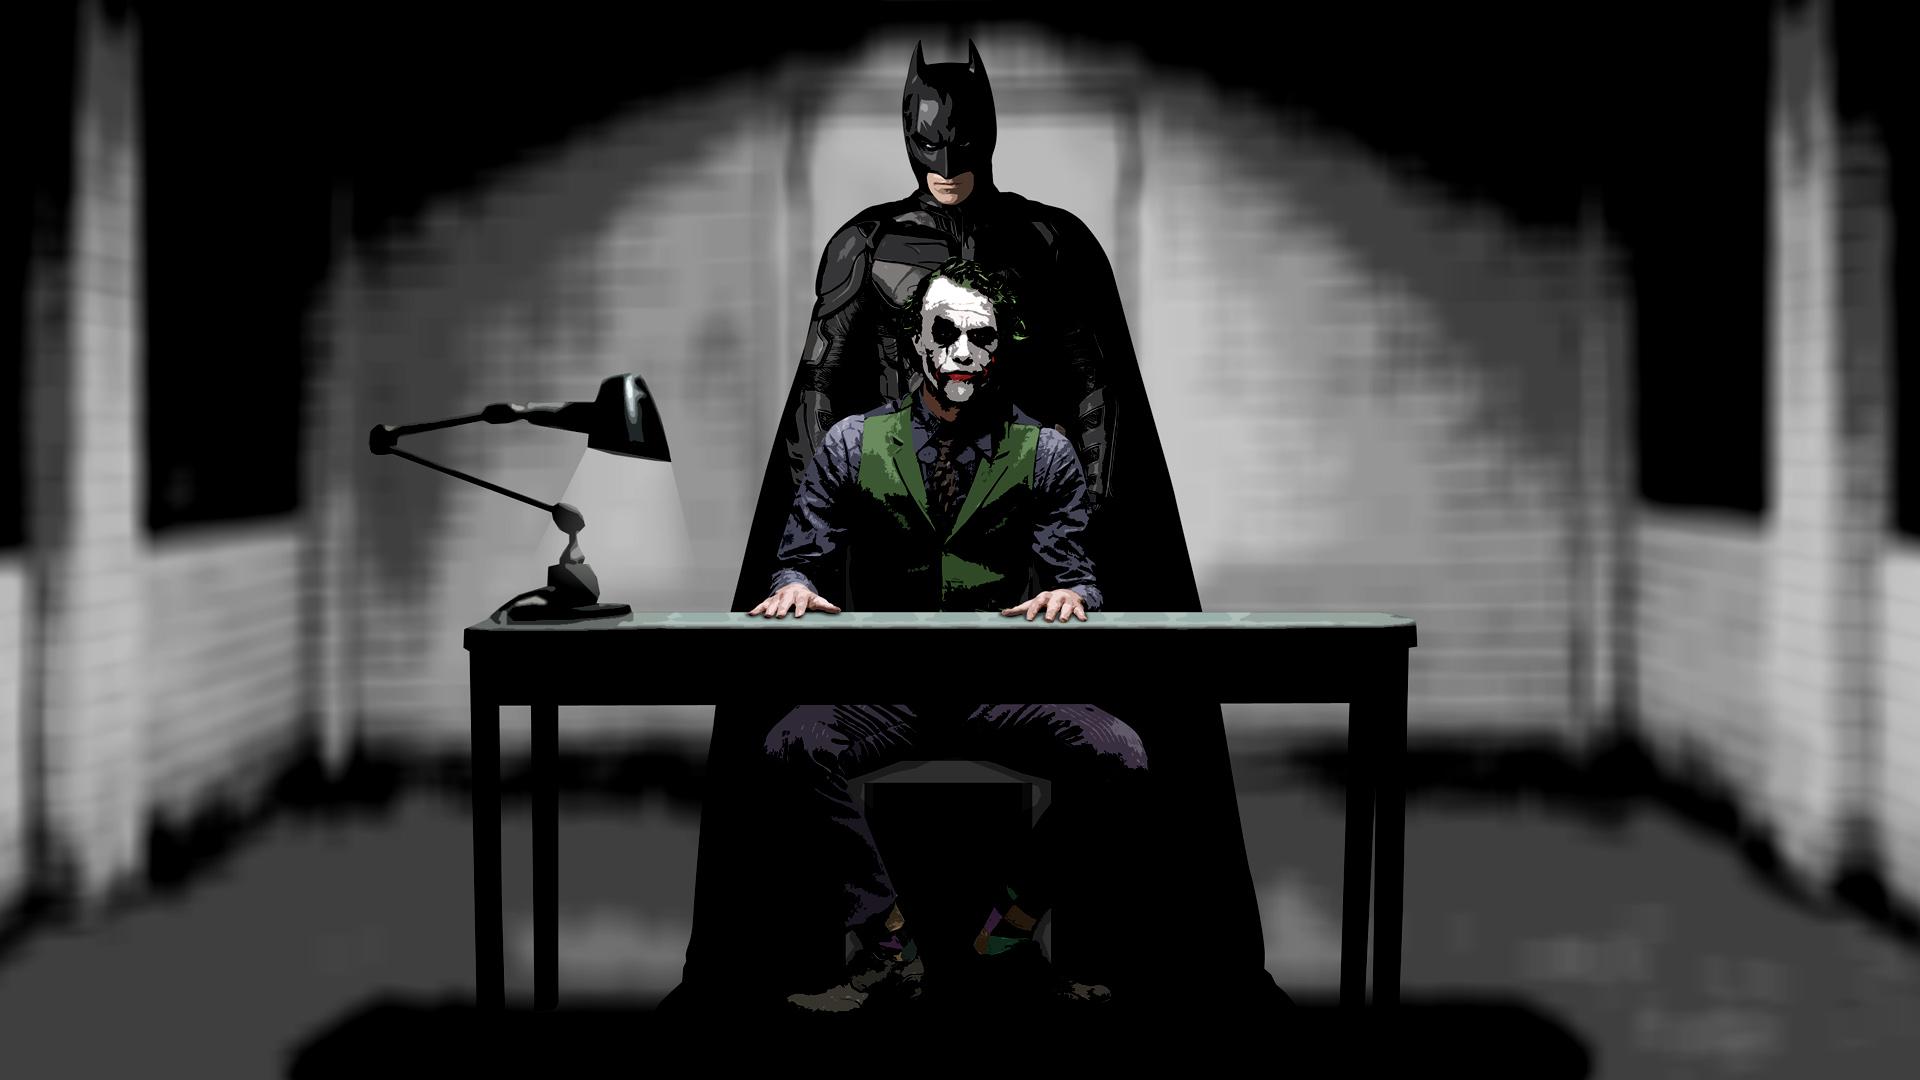 Batman the Joker Full HD Desktop Wallpapers 1080p 1920x1080